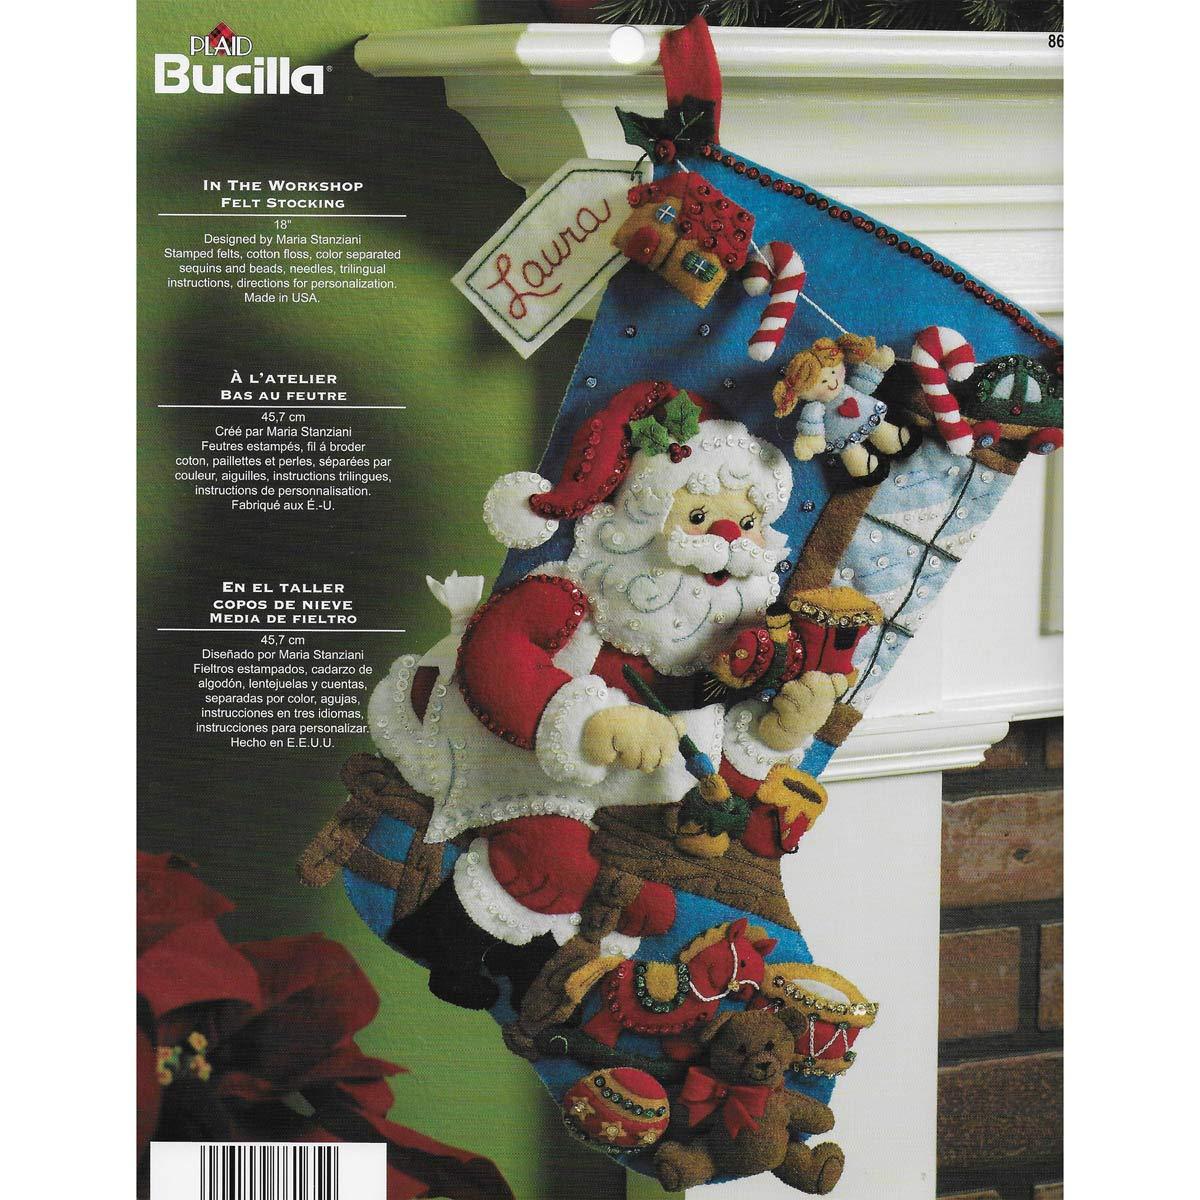 Bucilla Christmas Stocking Kits.Bucilla In The Workshop Stocking Felt Applique Kit 18 Long